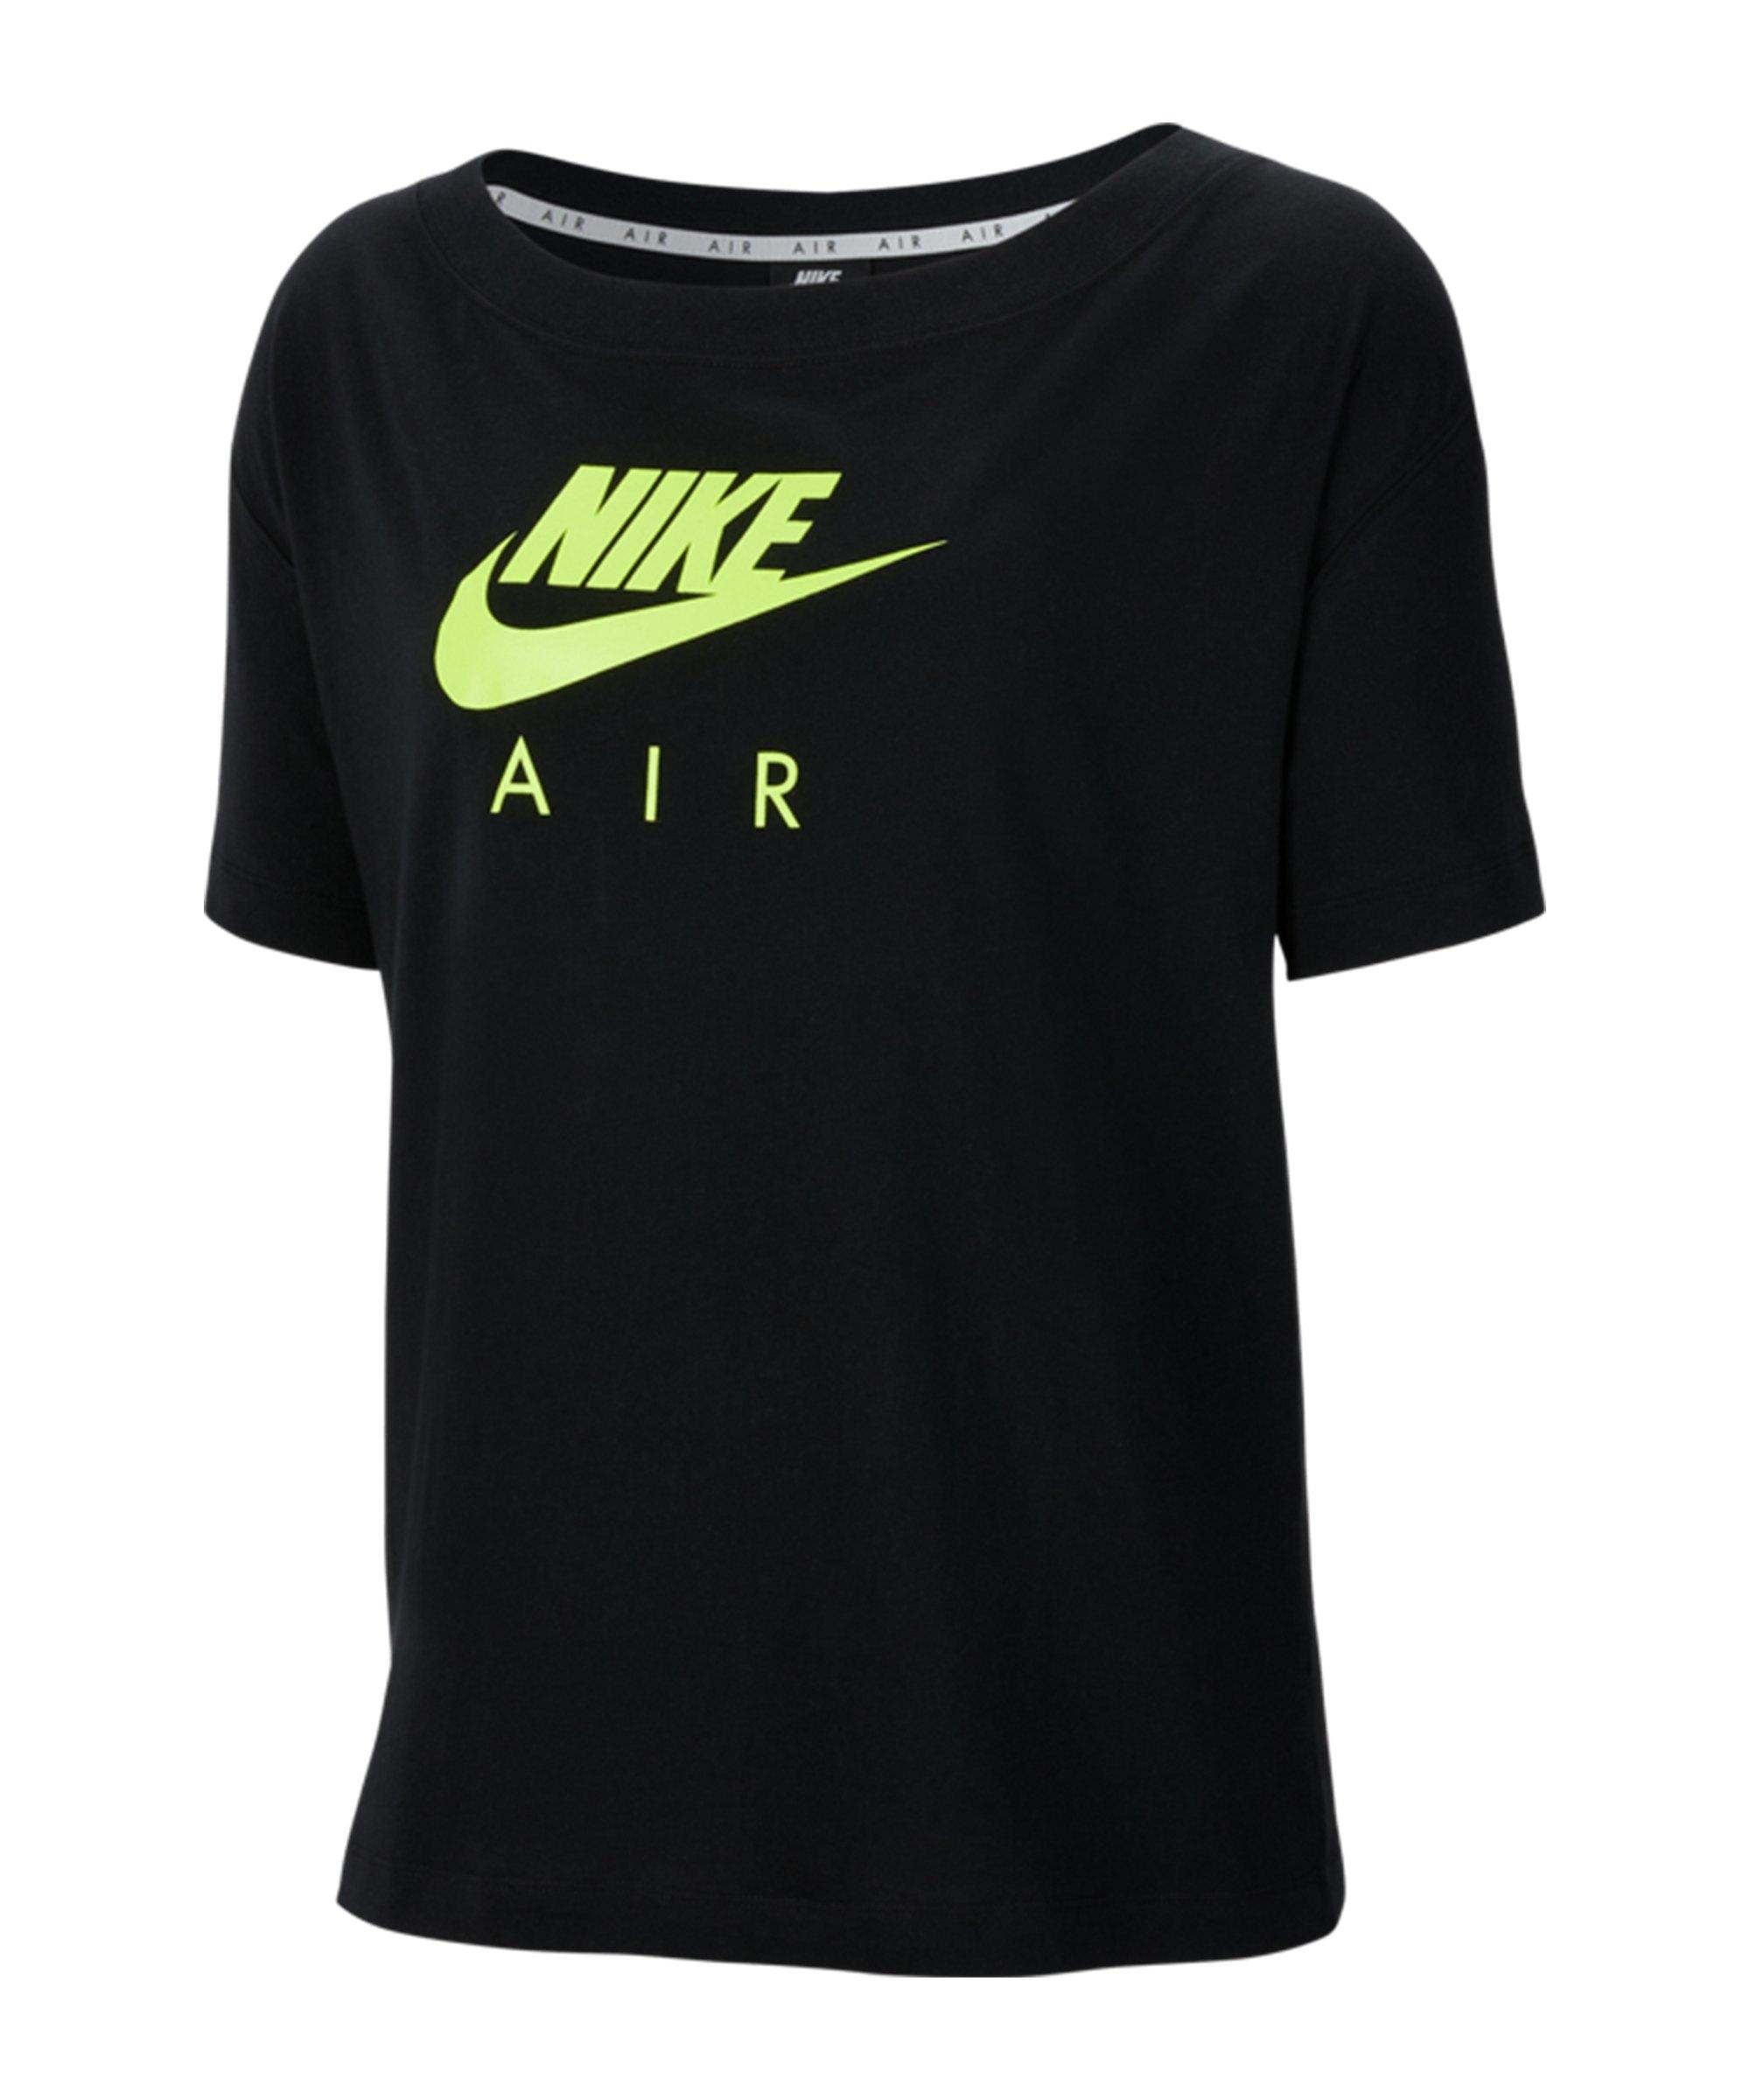 Nike Air T-Shirt Damen Schwarz F011 - schwarz